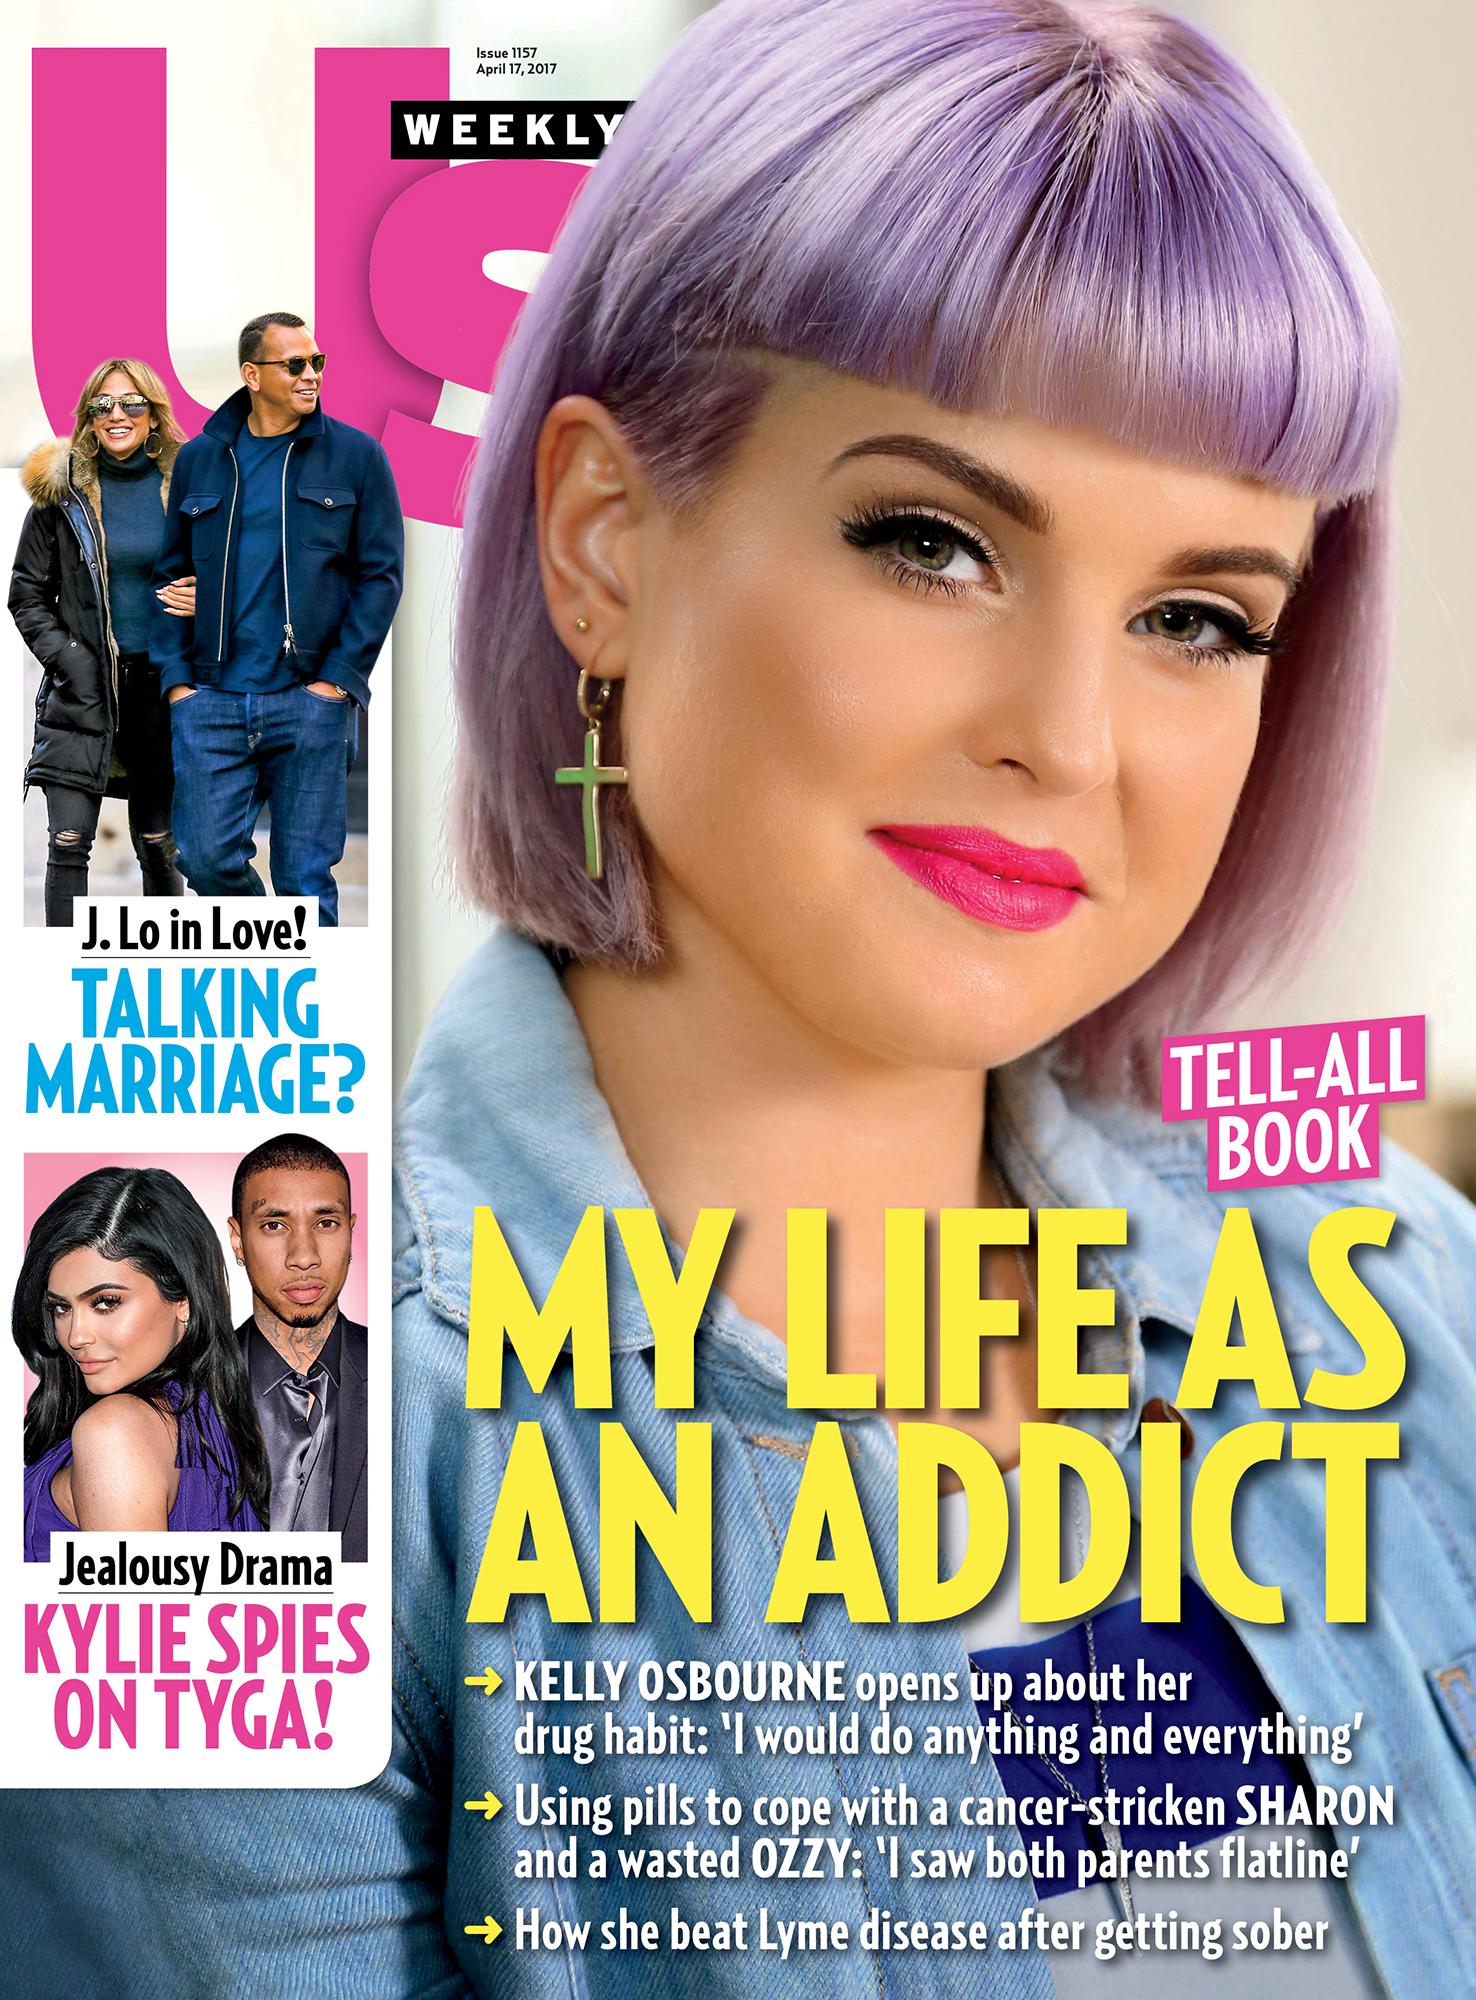 https://www.usmagazine.com/wp-content/uploads/cover-1fcaf128-c3c8-4a09-aa6a-72b727f3358b.jpg Kelly Osbourne 2017 Magazine